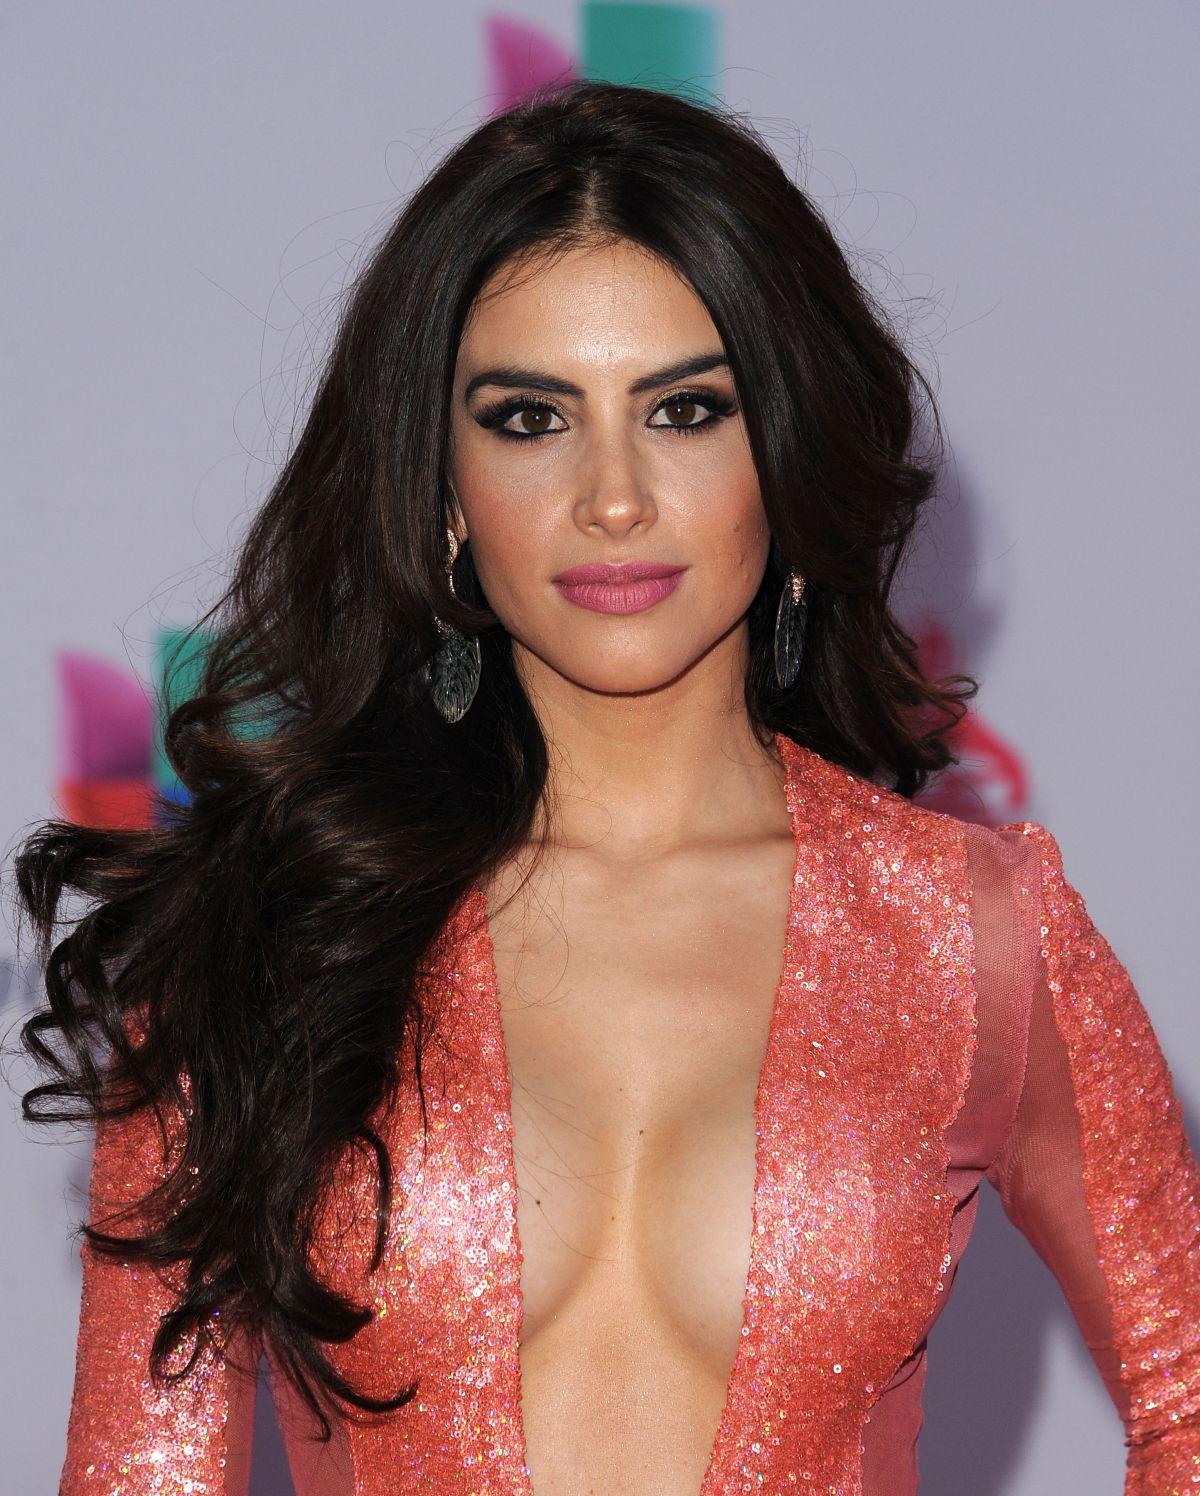 JESSICA CEDIEL at 2015 Latin Grammy Awards in Las Vegas 11/18/2015